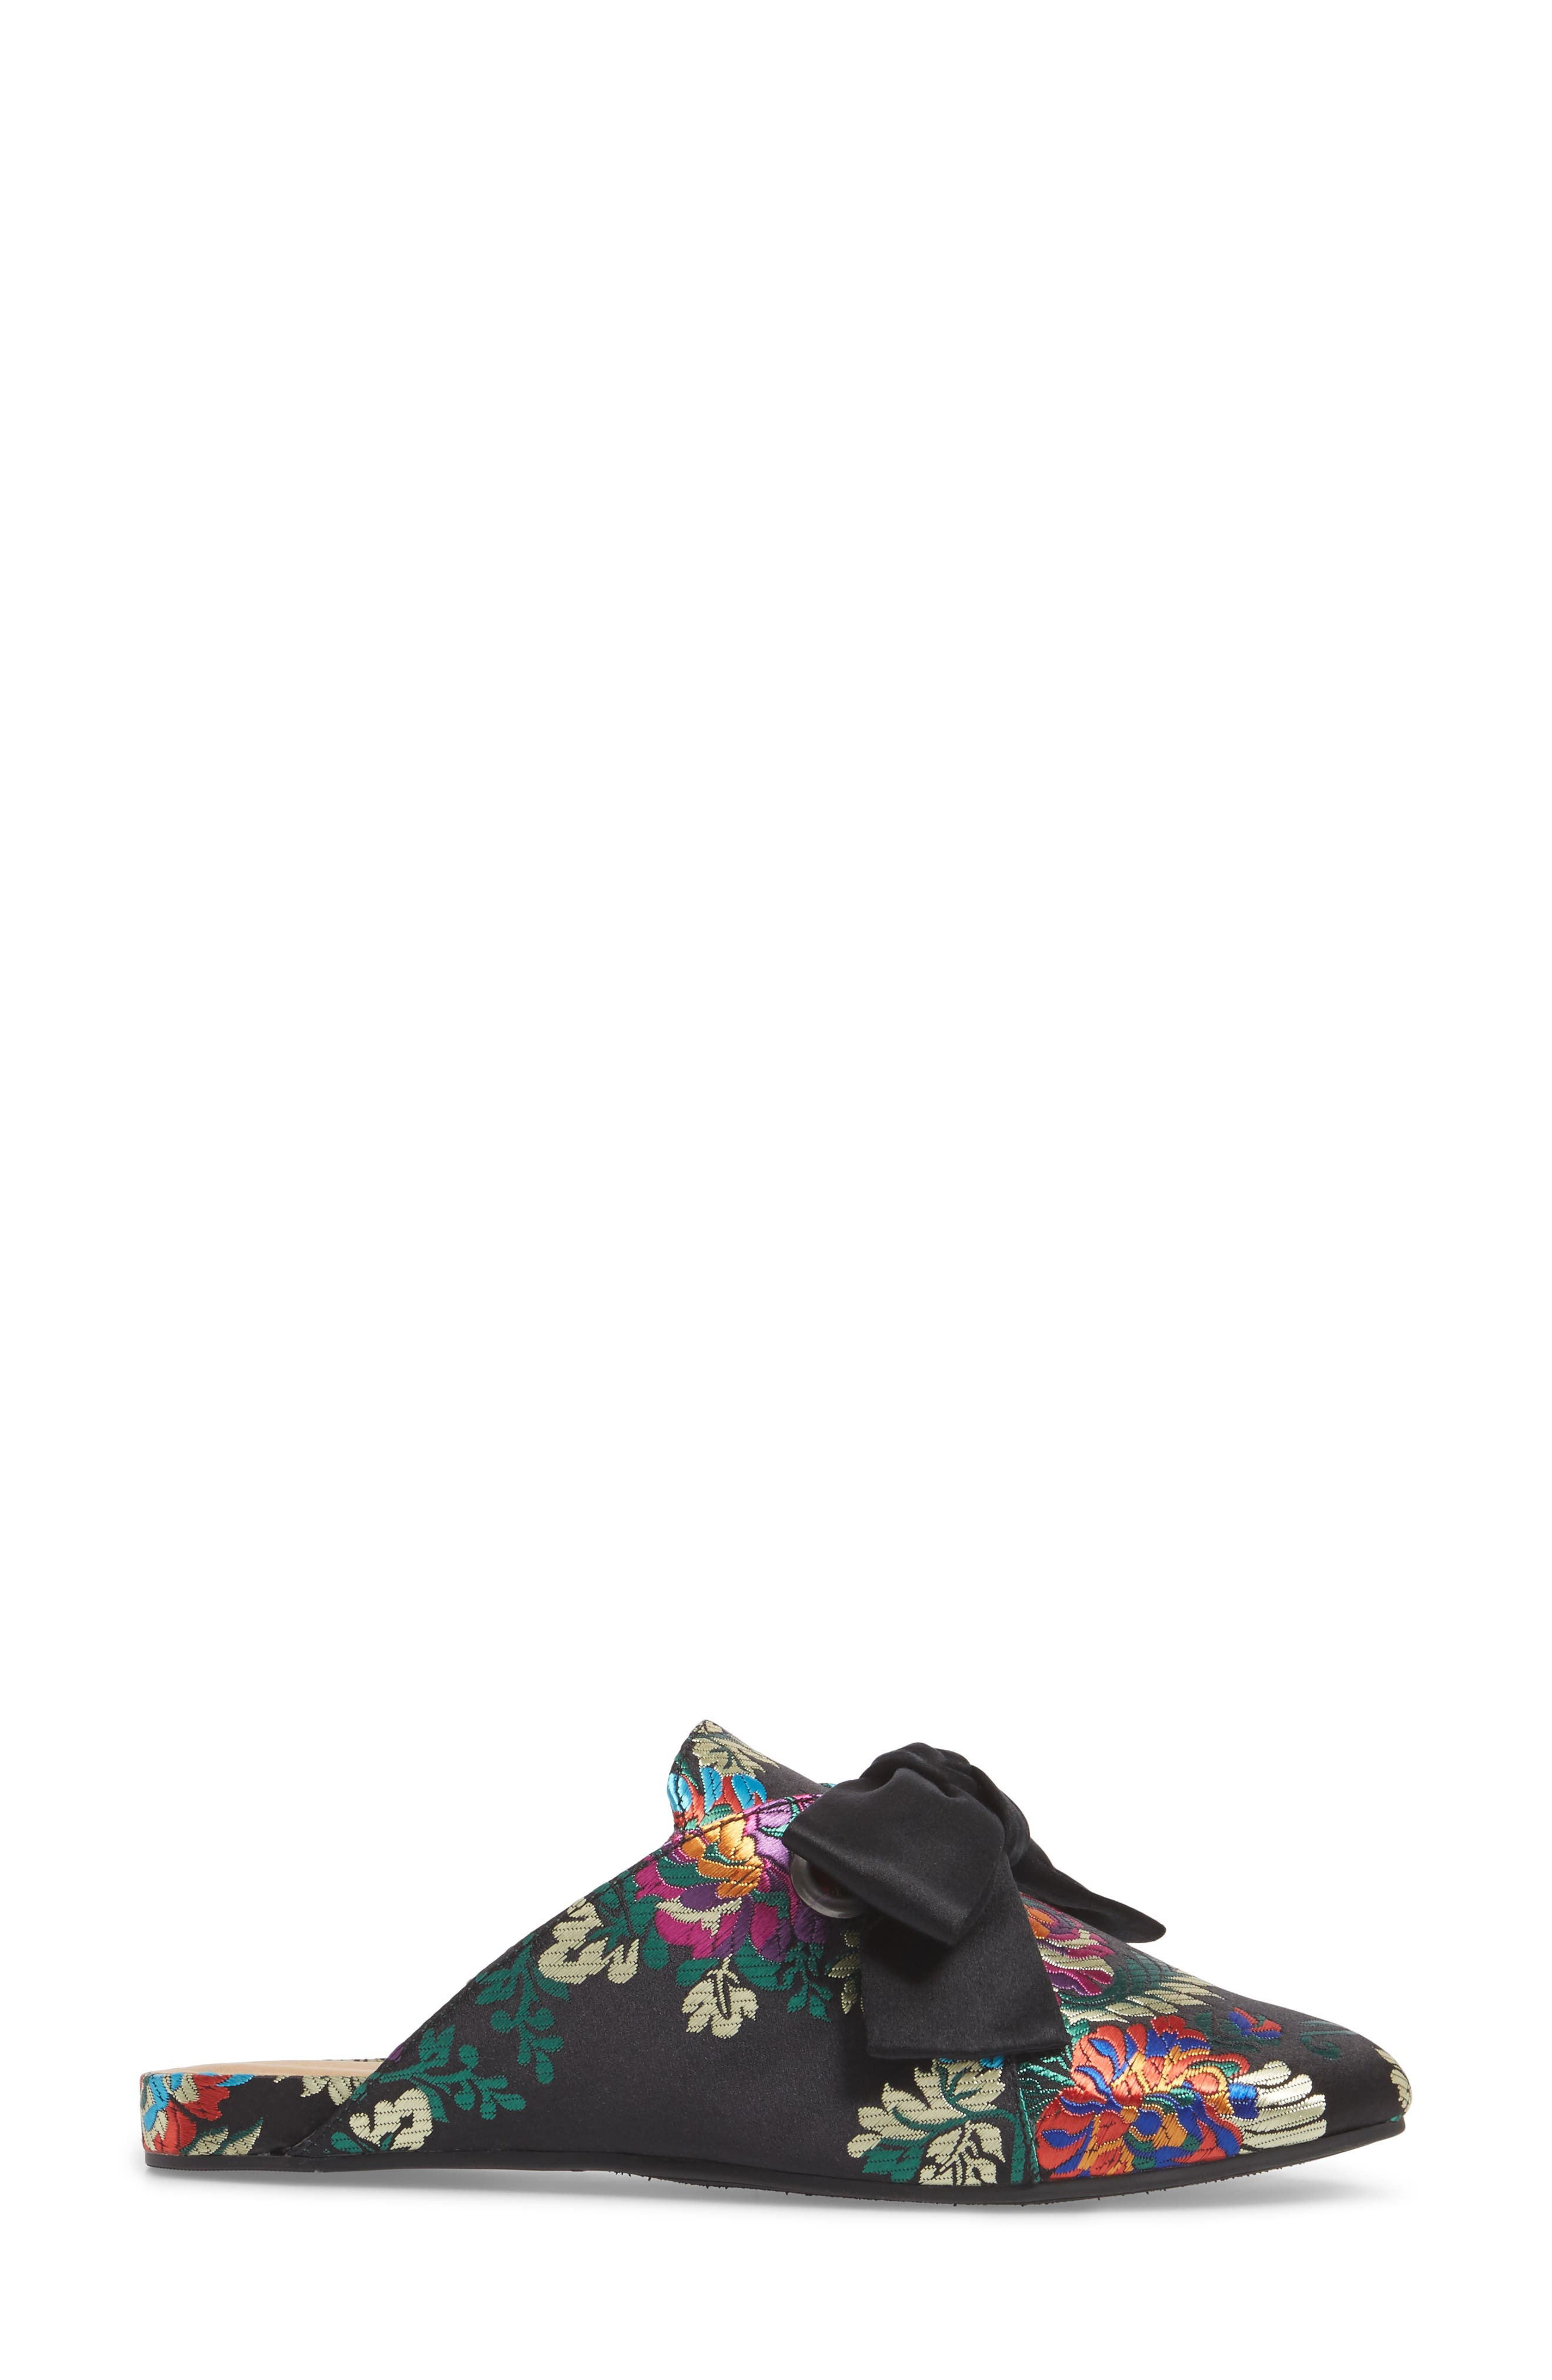 Florean Bow Loafer Mule,                             Alternate thumbnail 3, color,                             001